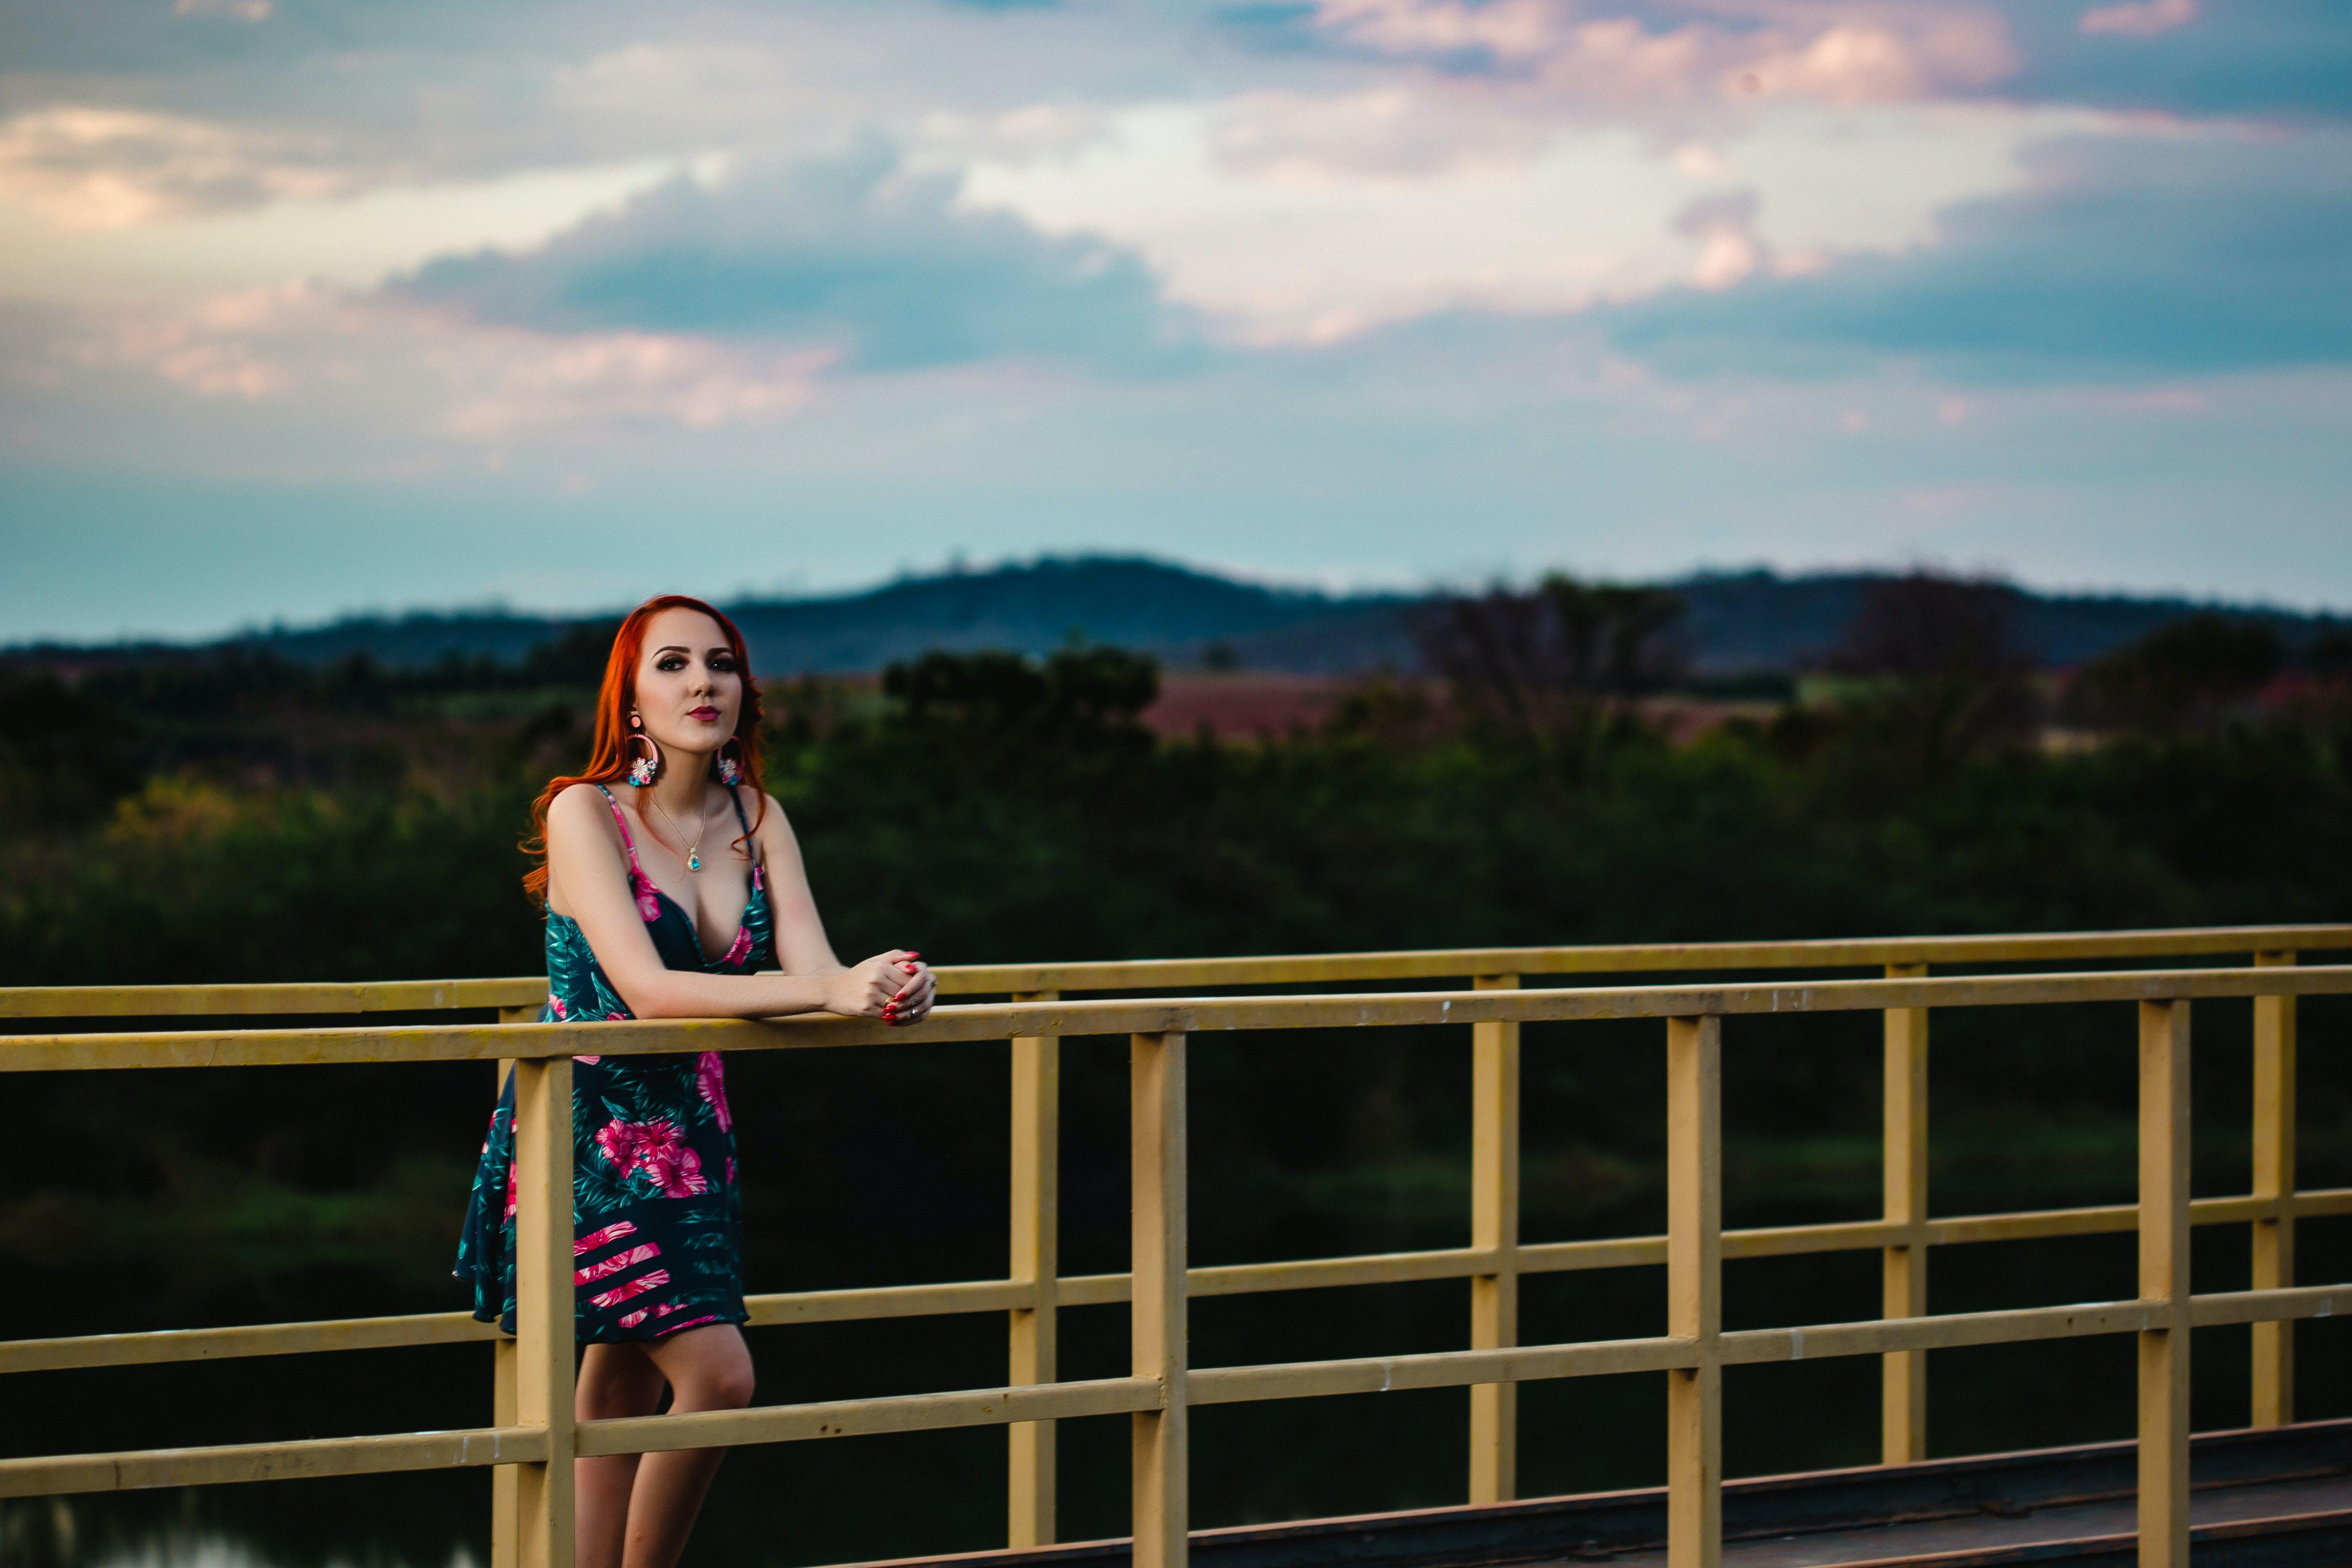 Woman Leaning on Yellow Steel Fence on Bridge